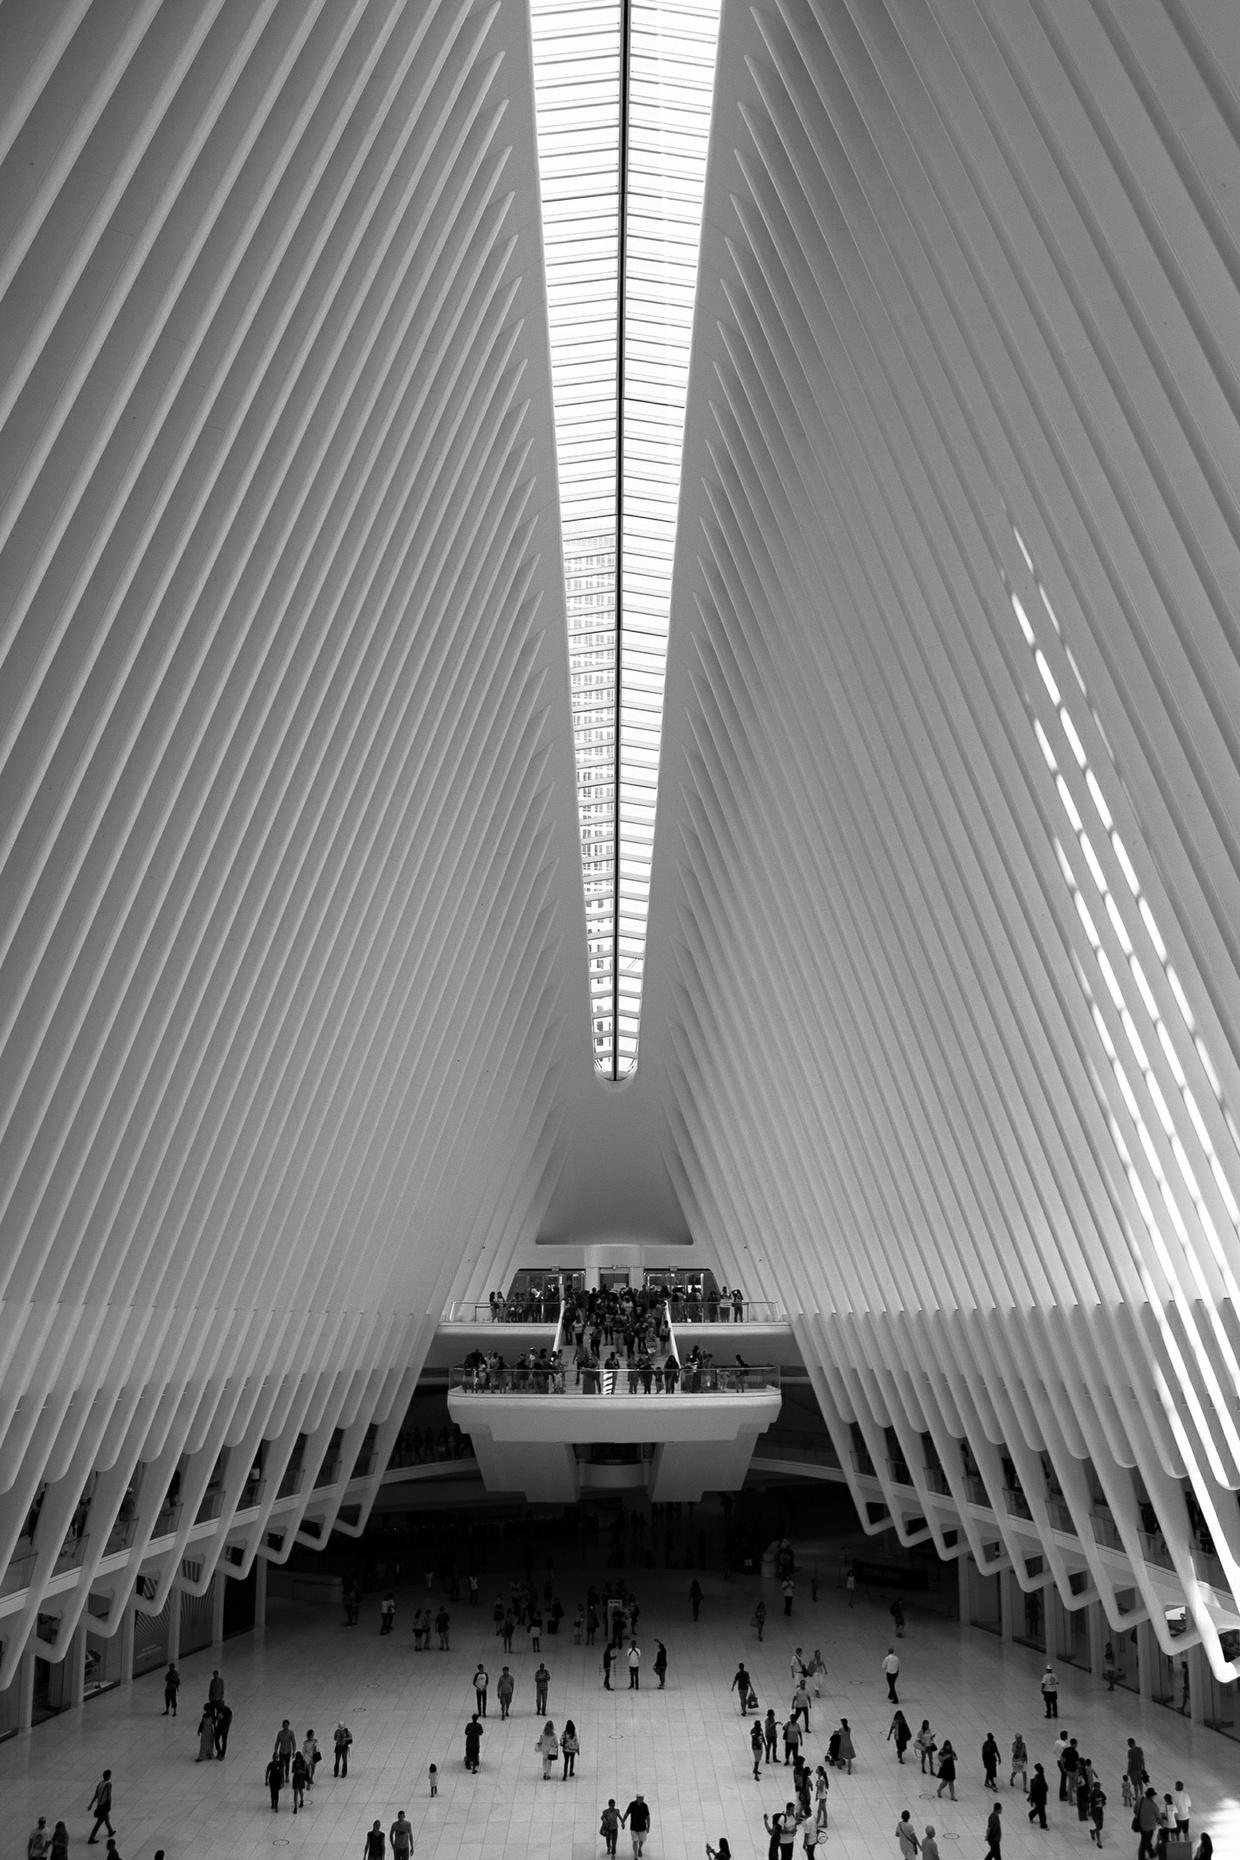 New York Stories 1 - Oculus